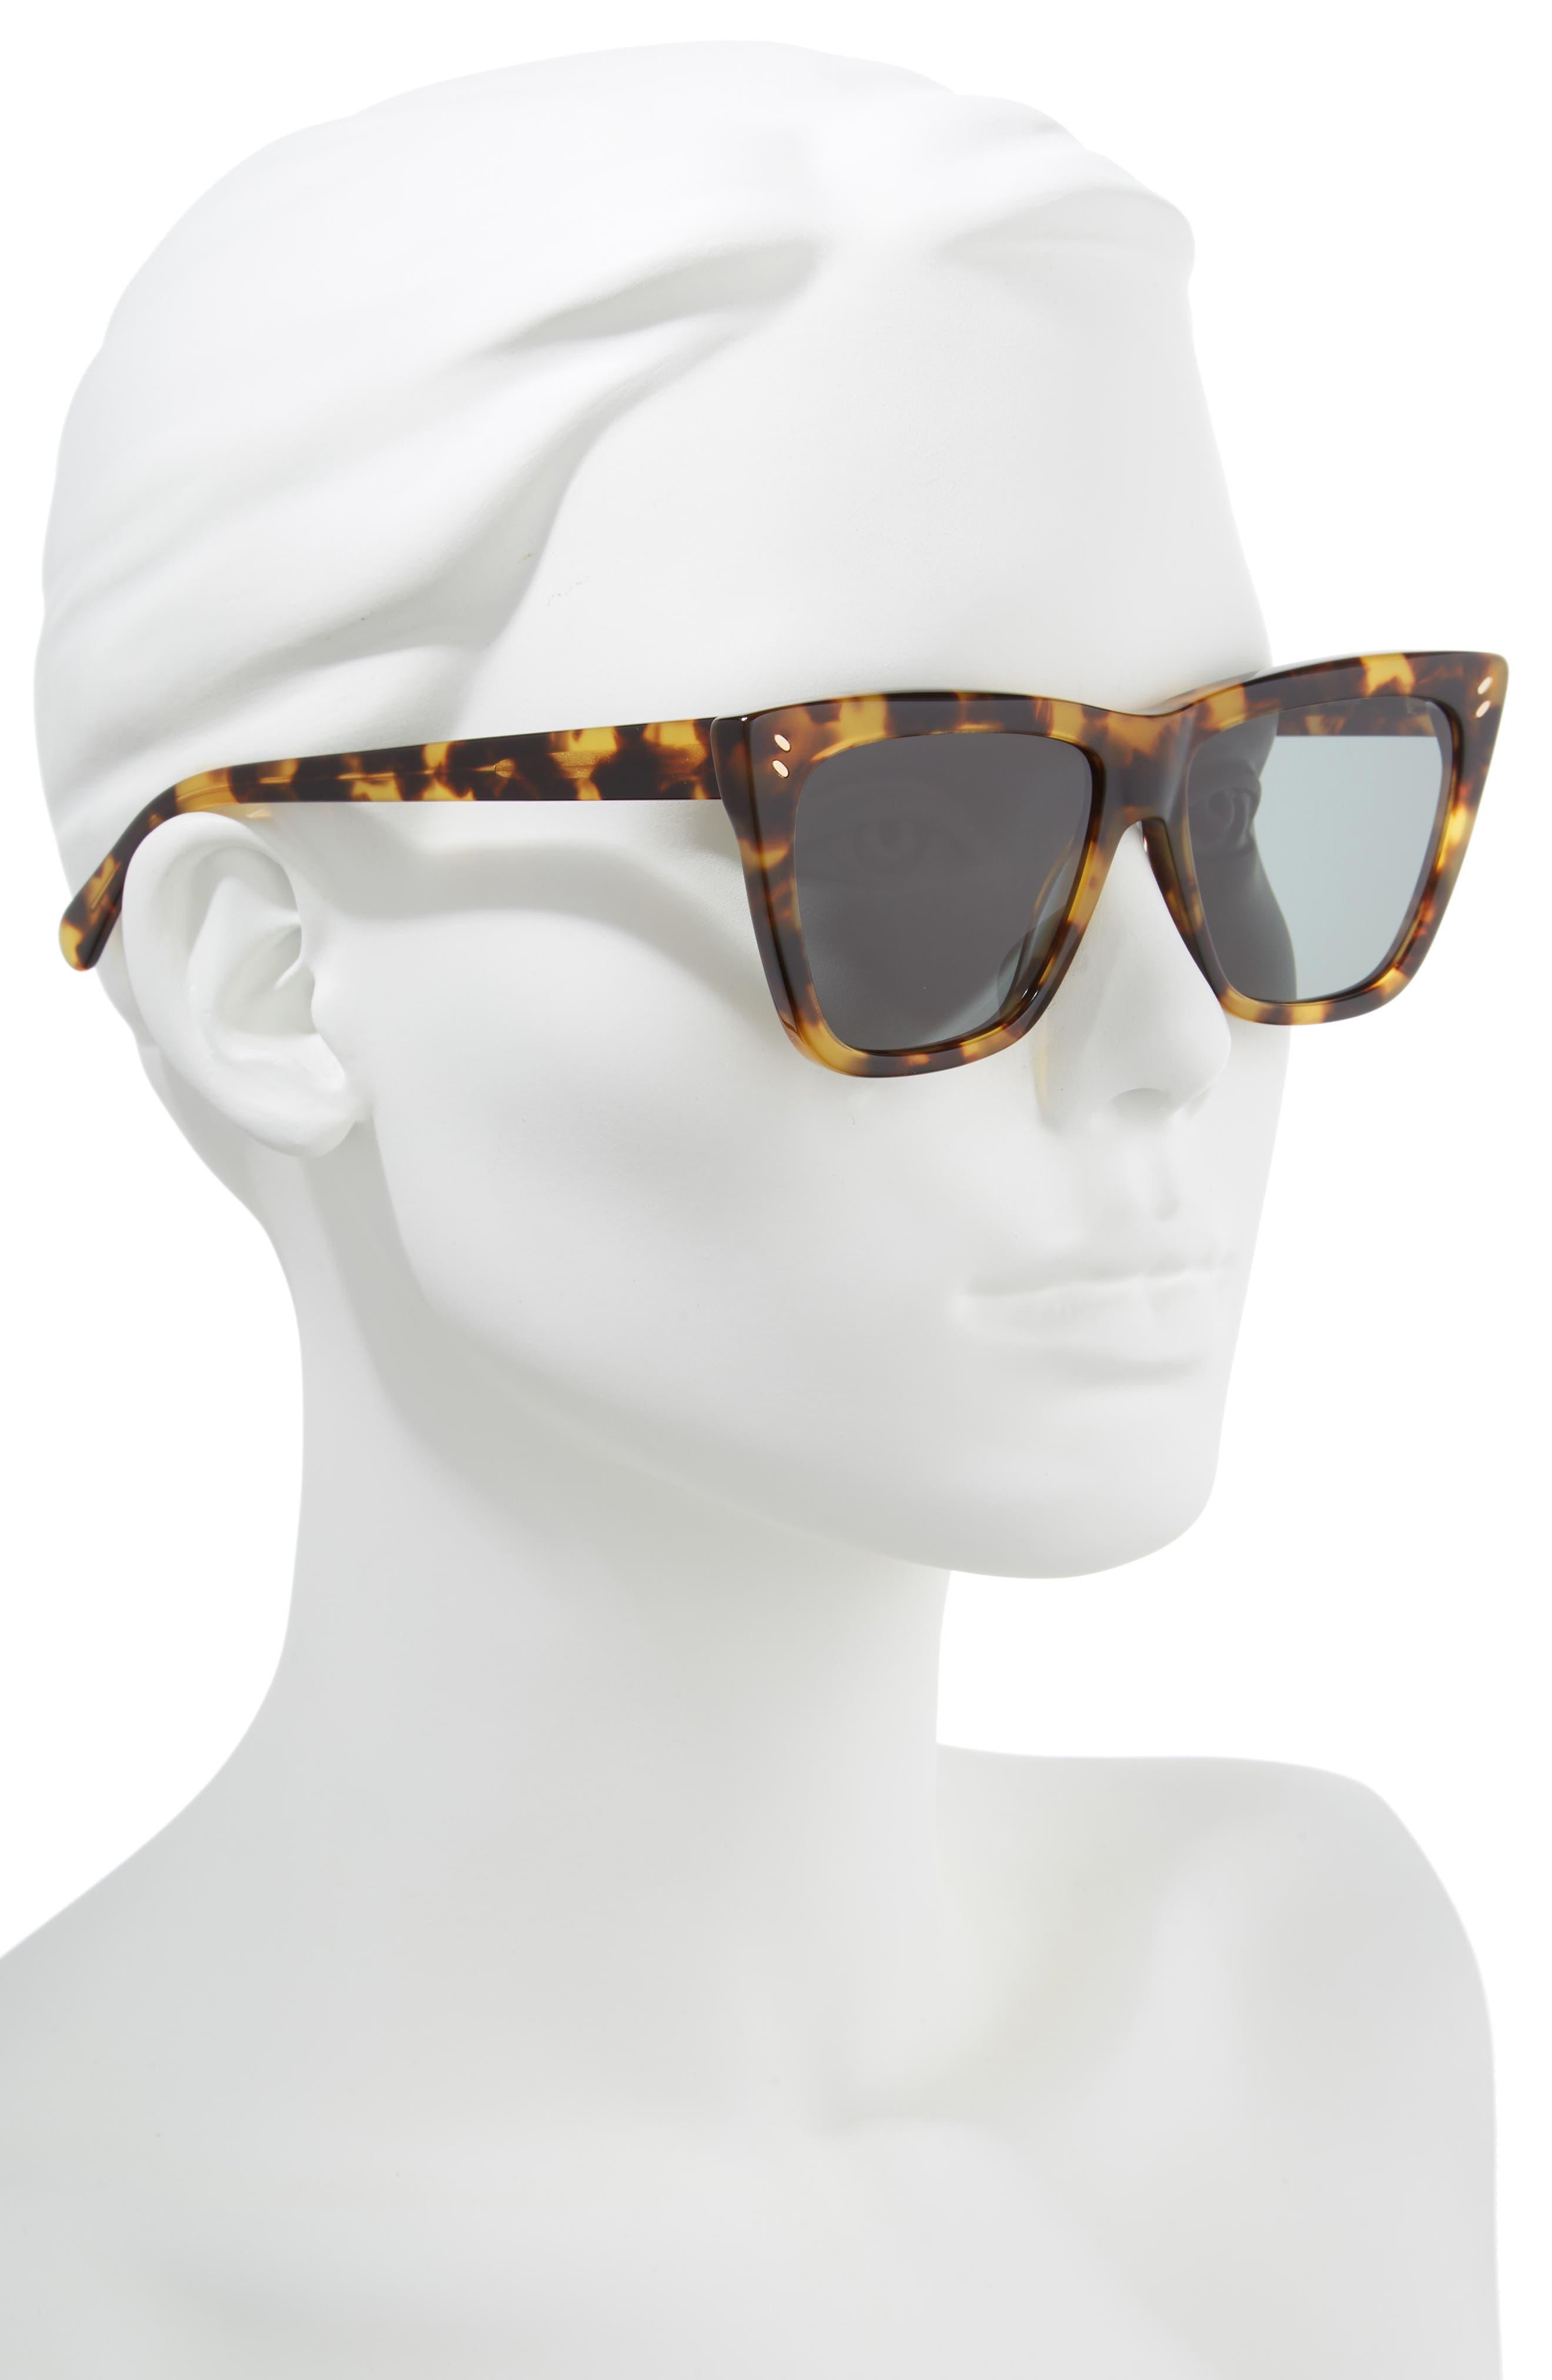 55mm Polarized Sunglasses,                             Alternate thumbnail 2, color,                             Medium Havana